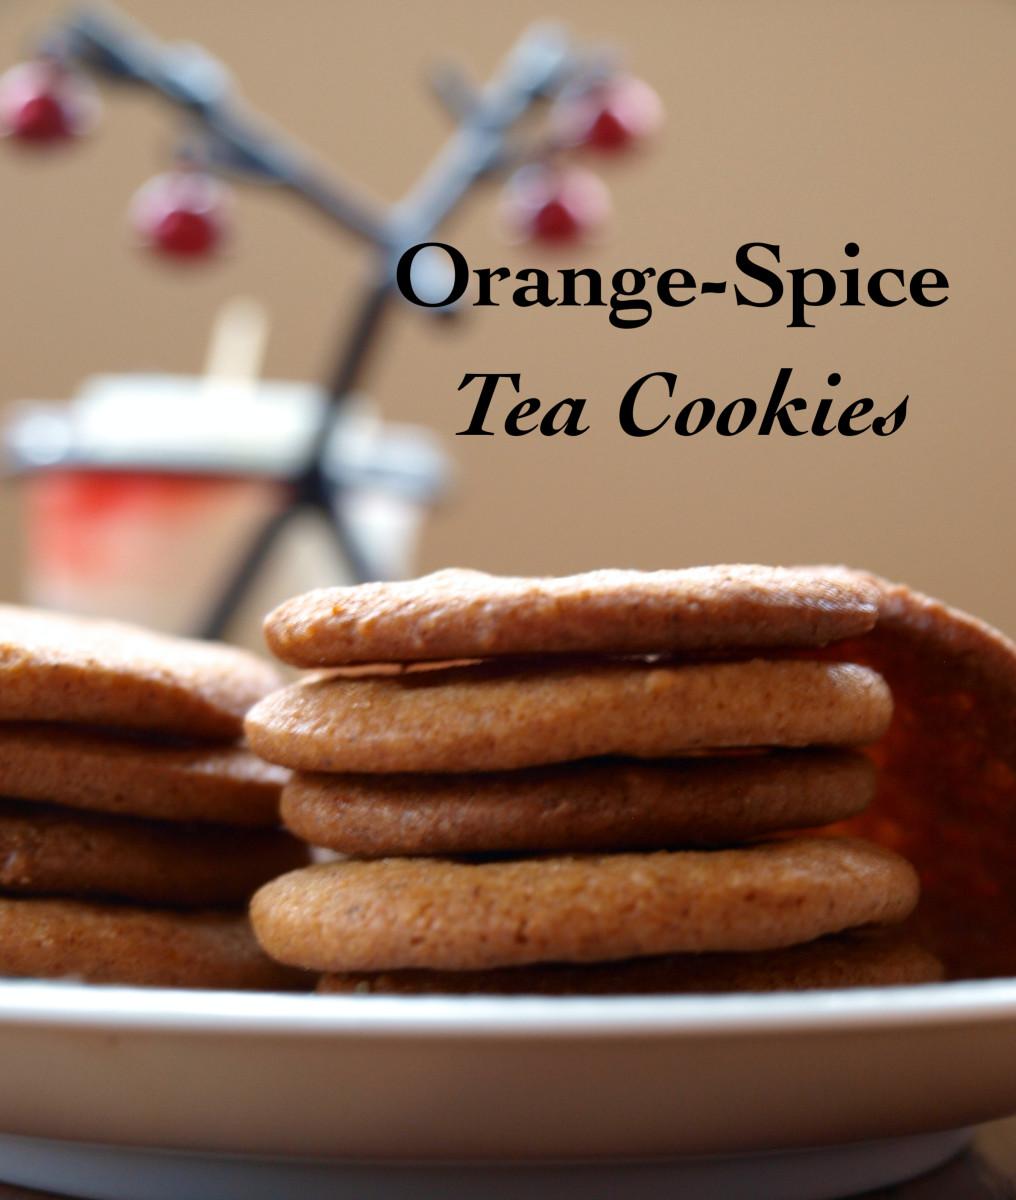 Orange-Spice Tea Cookies Recipe